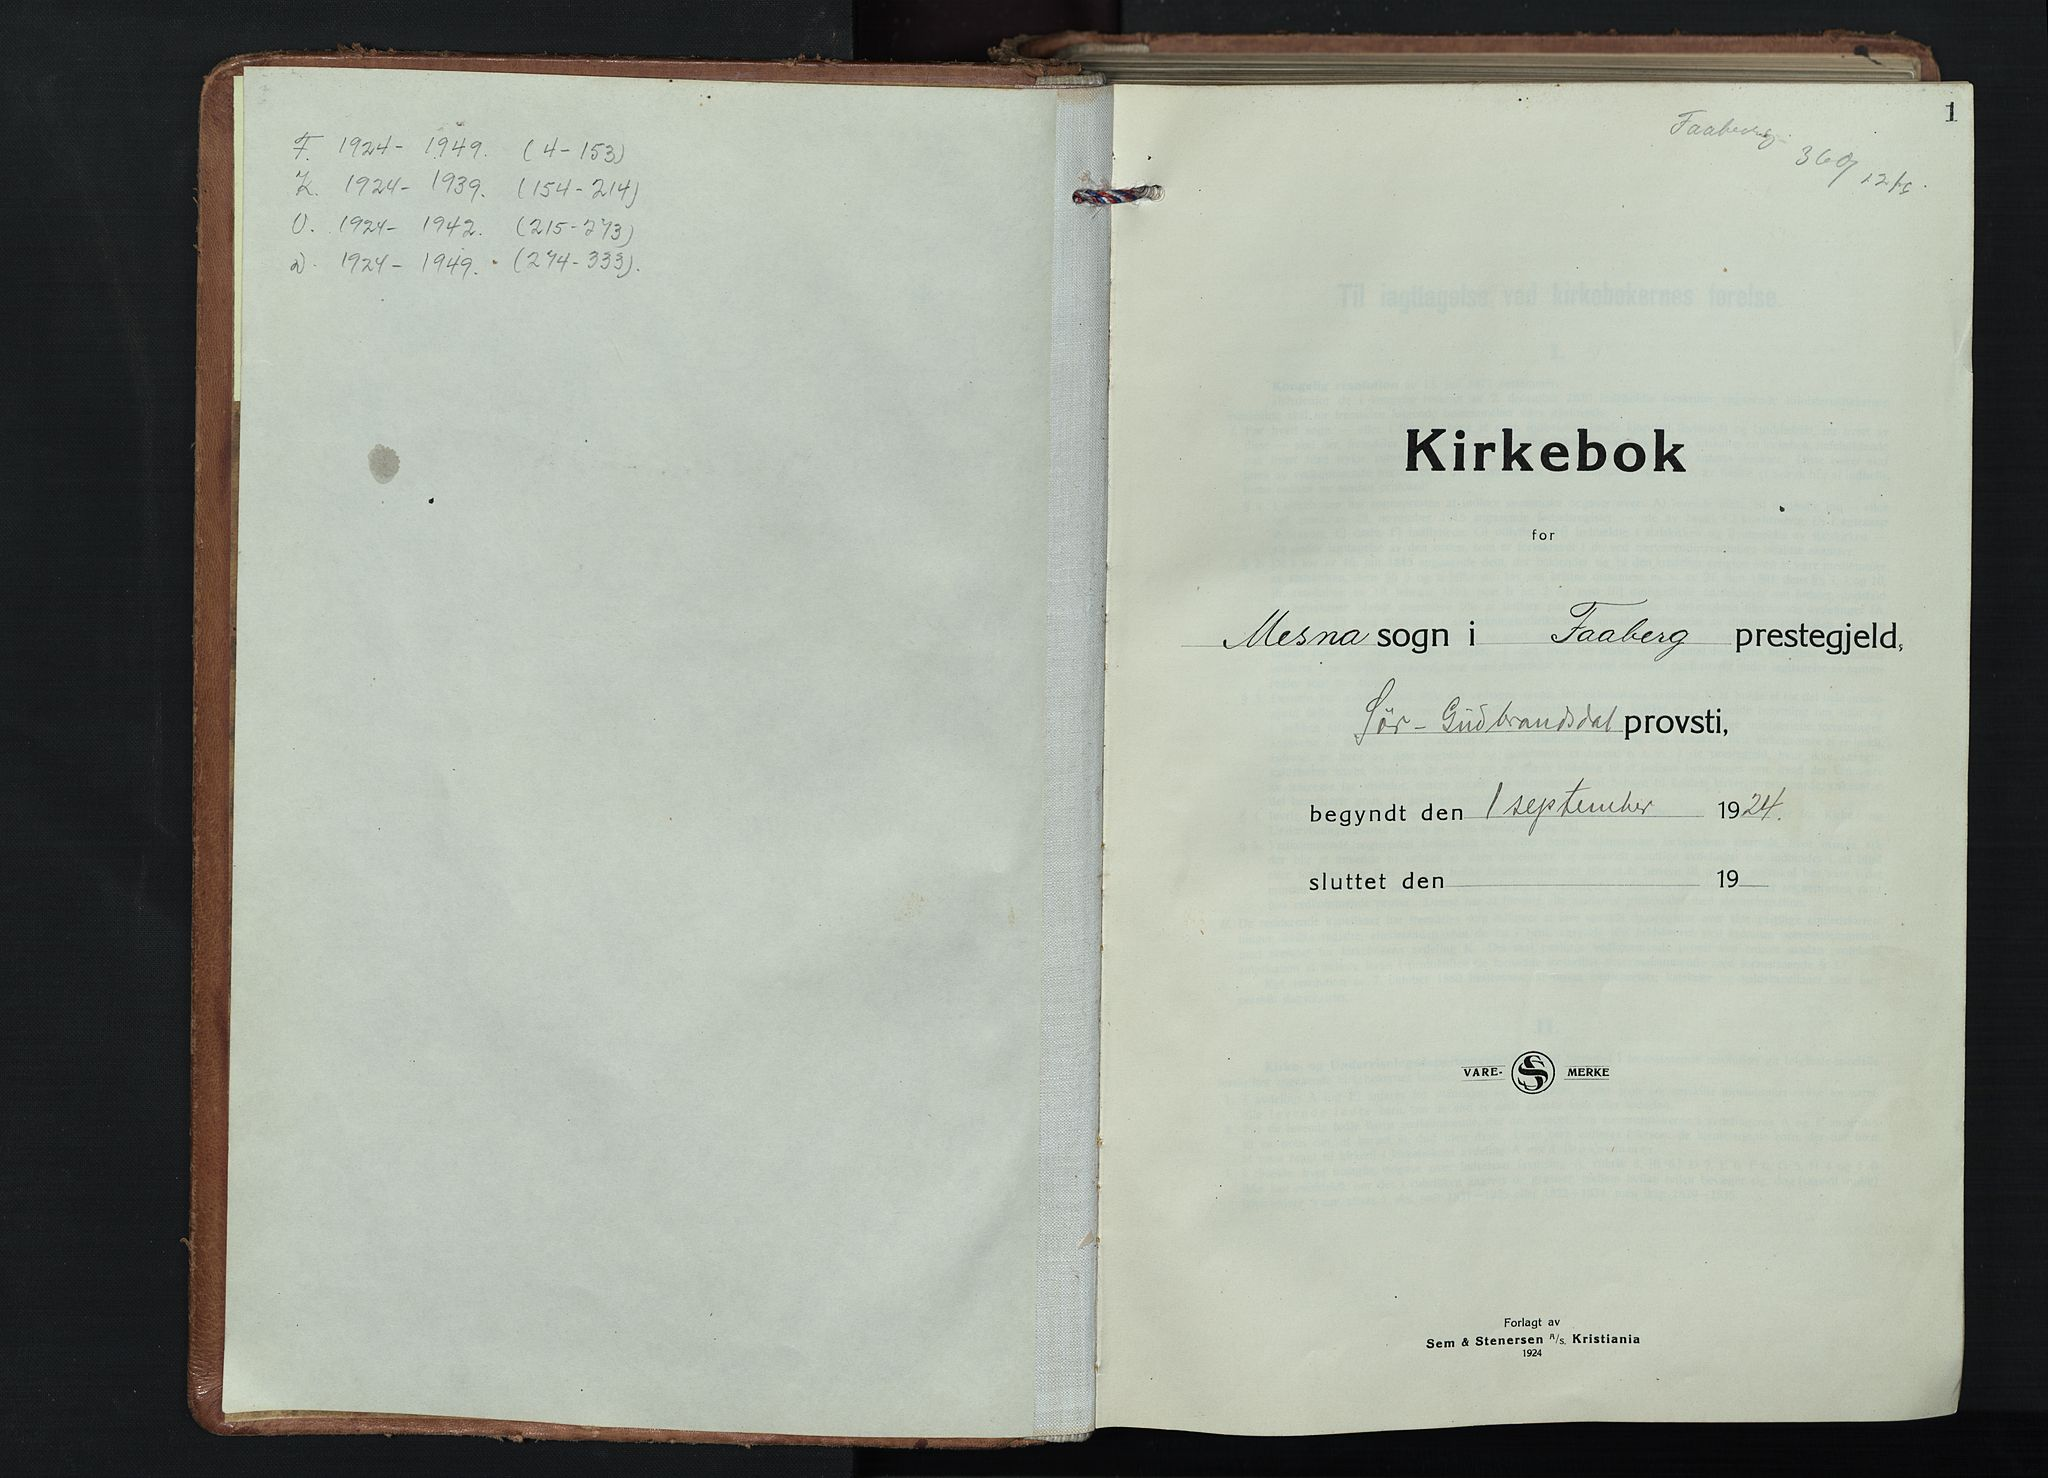 SAH, Fåberg prestekontor, Klokkerbok nr. 15, 1924-1949, s. 1